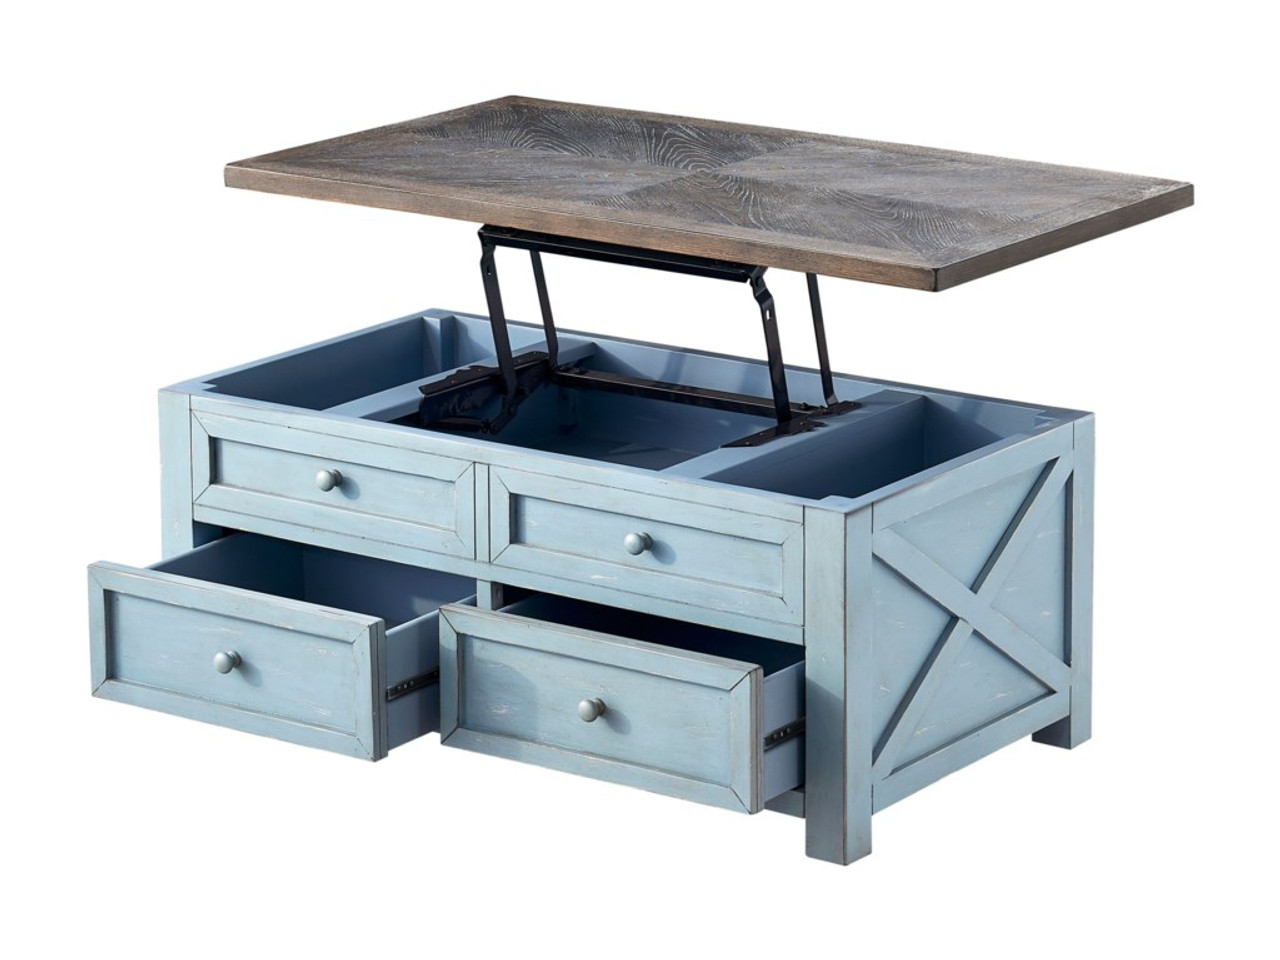 Bar Harbor Lift Top Coffee Table Manteo Furniture Appliance